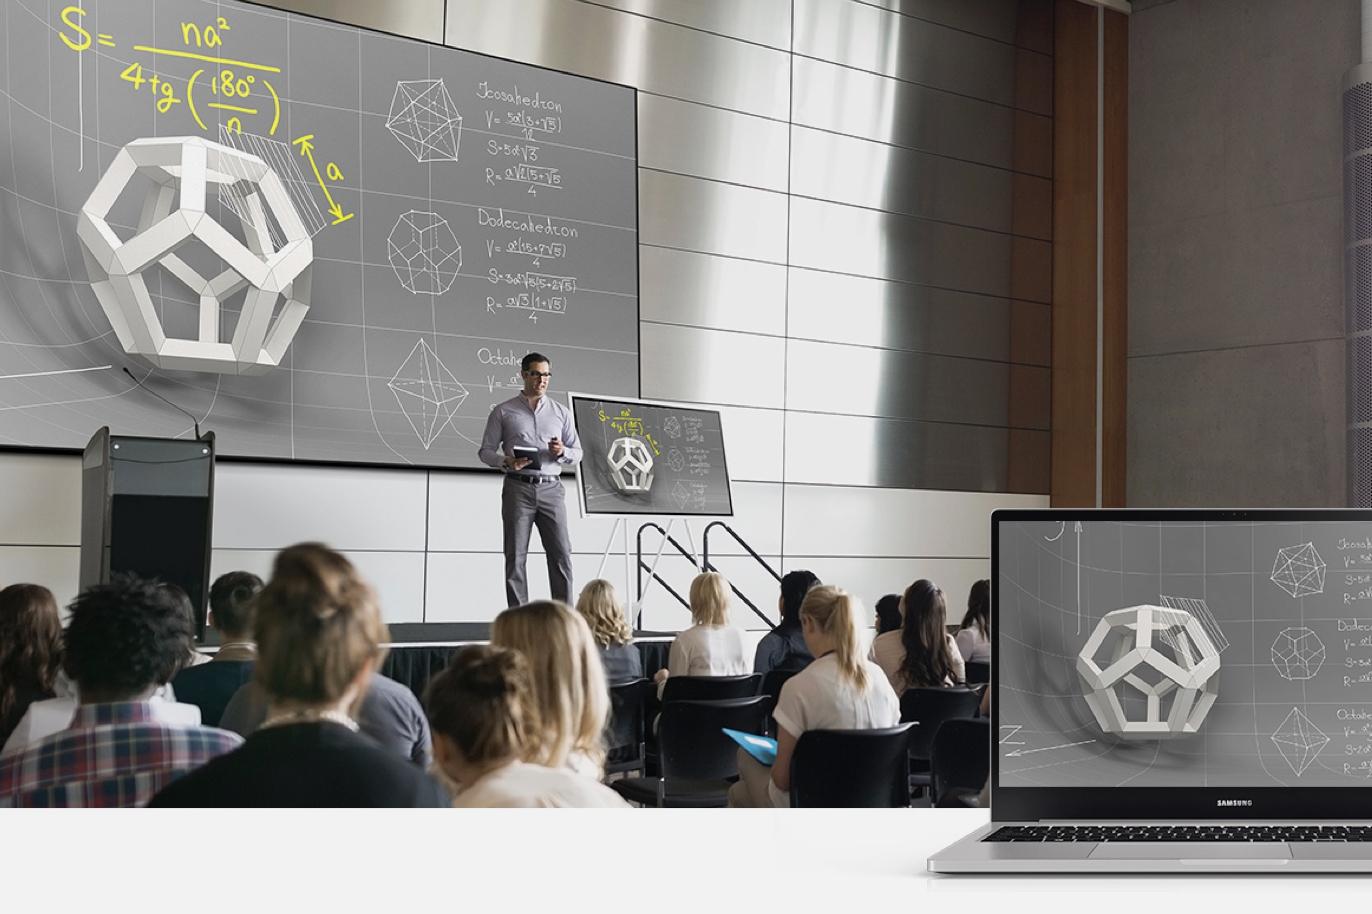 Samsung Flip 2—全新數位屏幕 - PC Flip2 55inch 10 6 1 THREE COLUMN